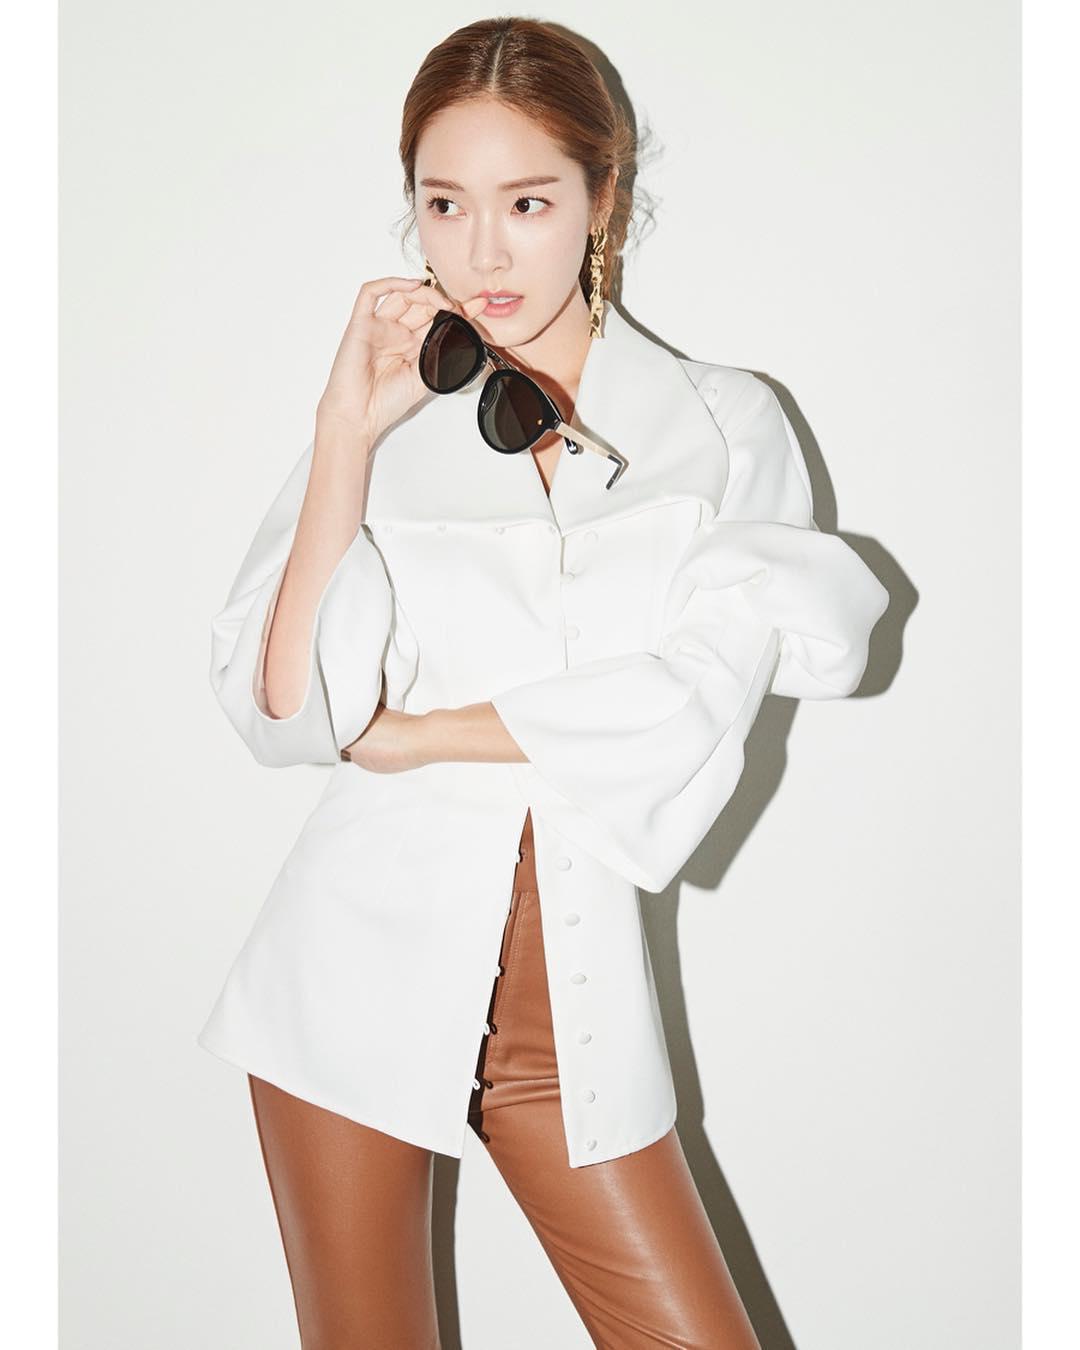 Jessica-Jung-8